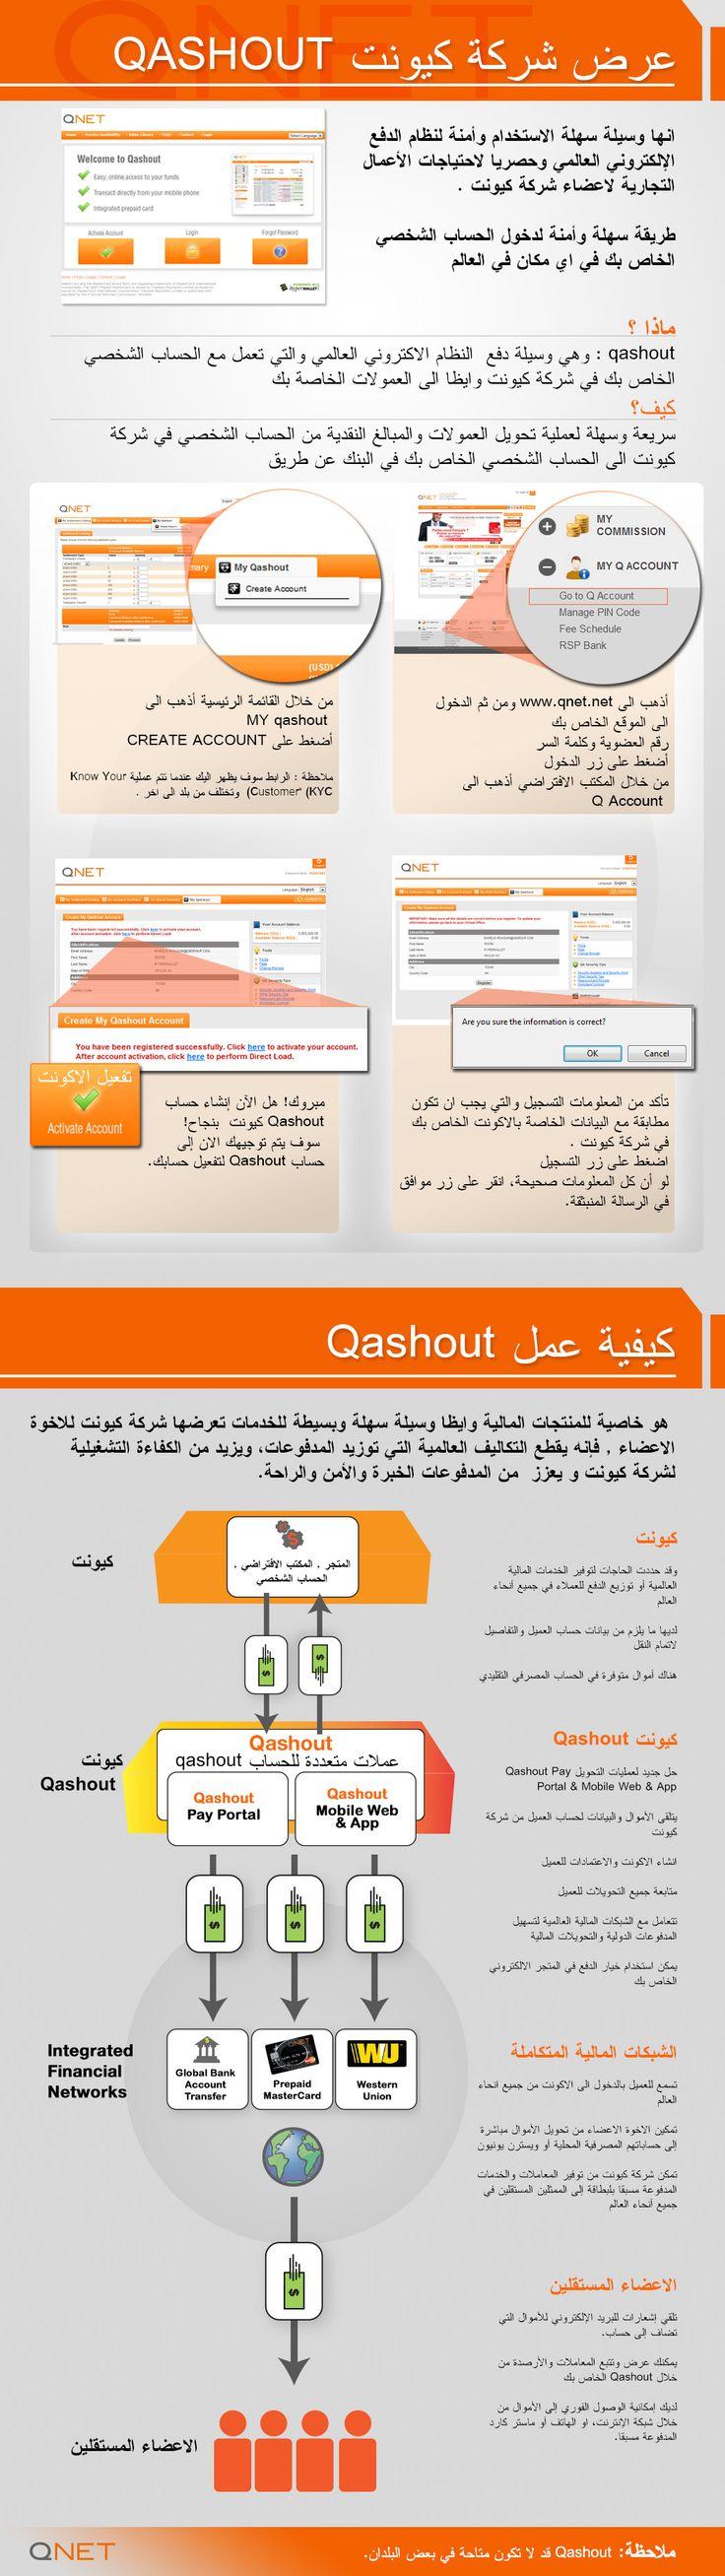 Introducing... QNET Qashout [Arabic]